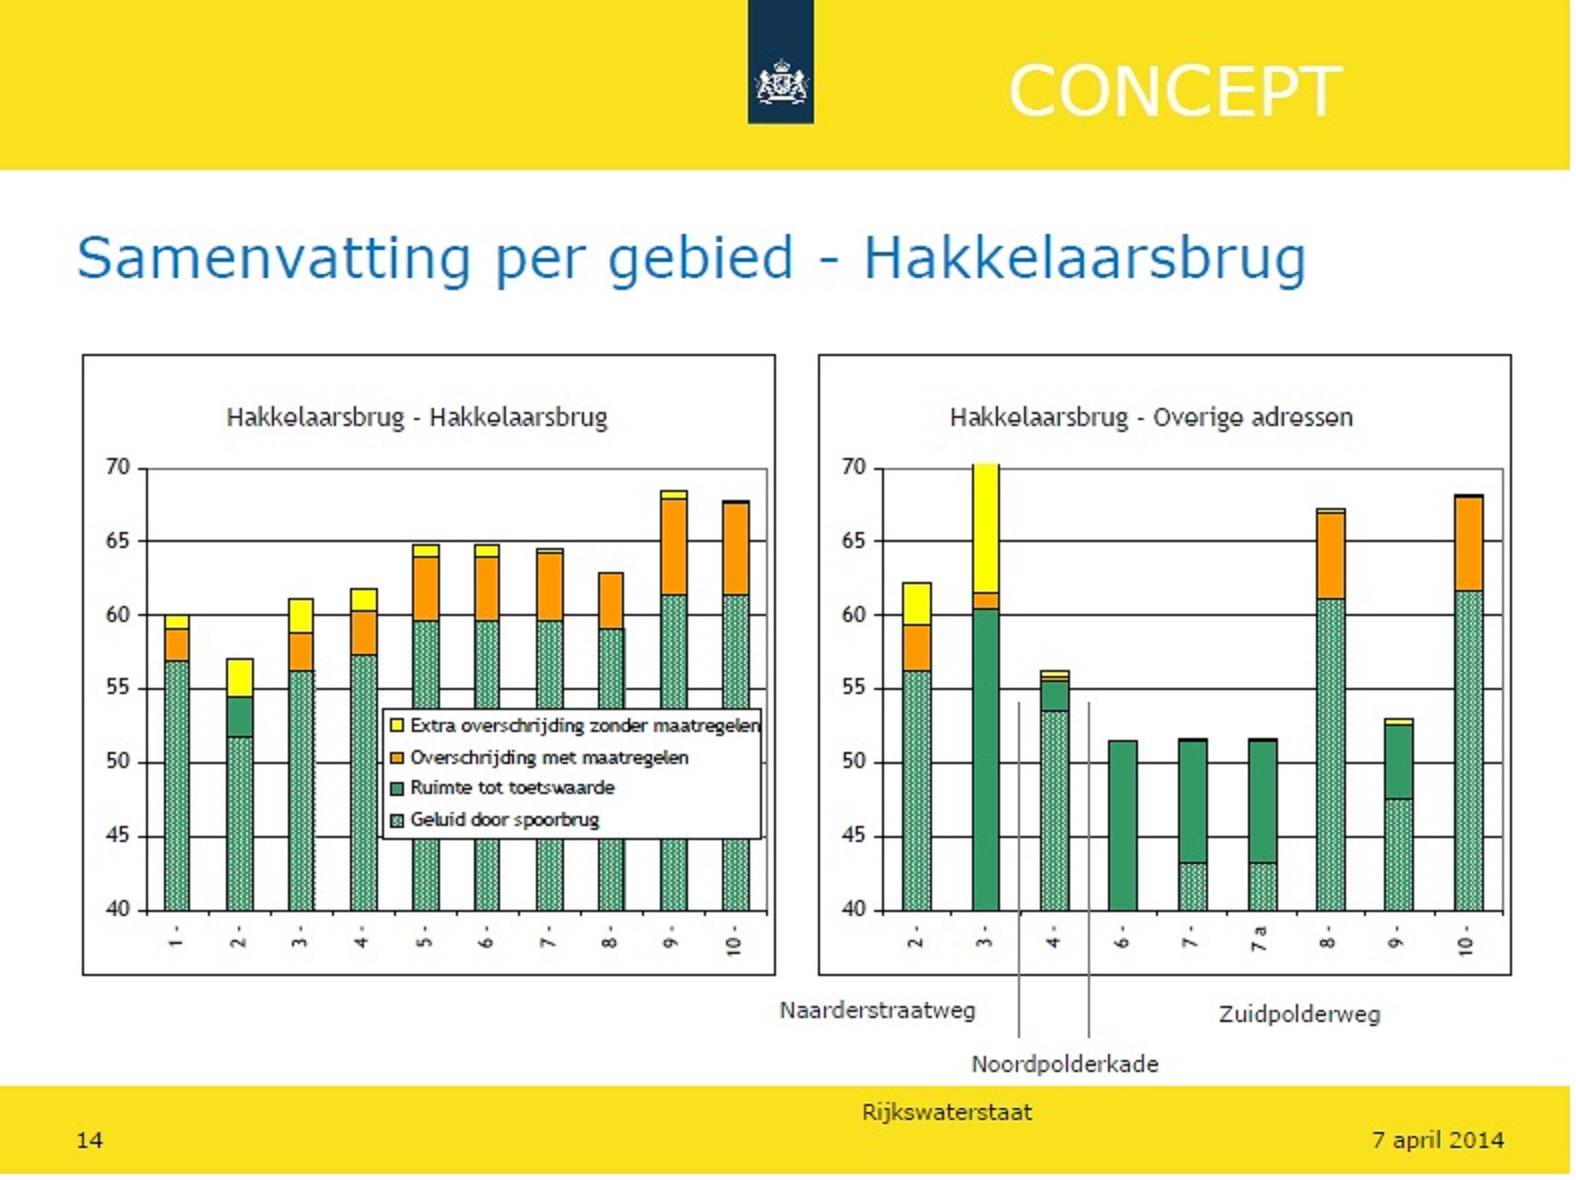 presentatie RWS Muiderberg-Geluid slide 14-2